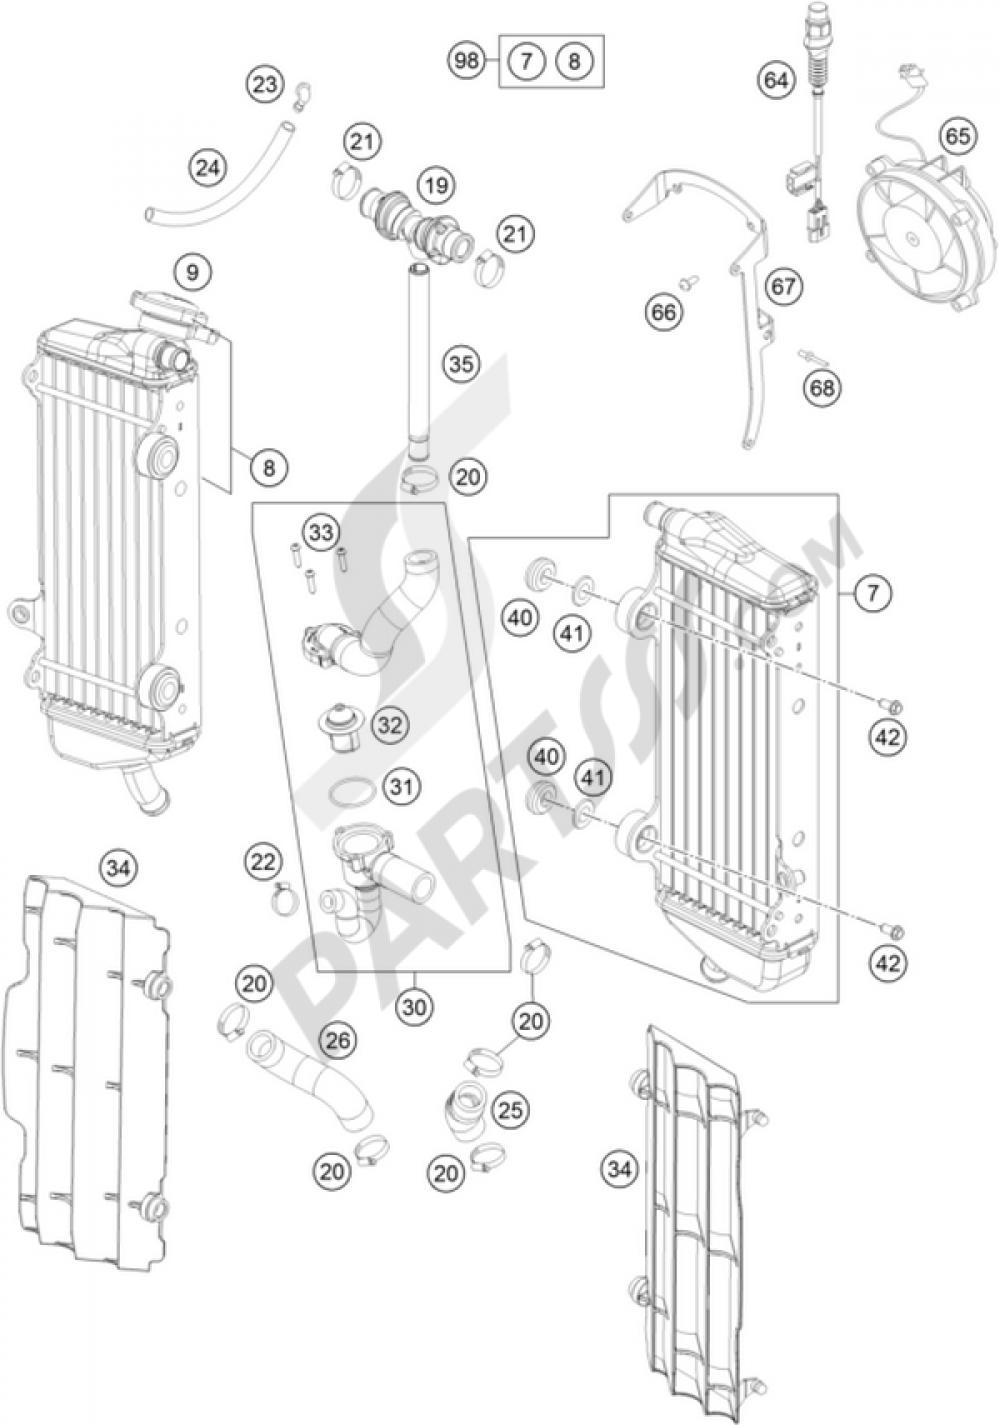 Cooling System Ktm 450 Exc 2009 Eu Wiring Diagram